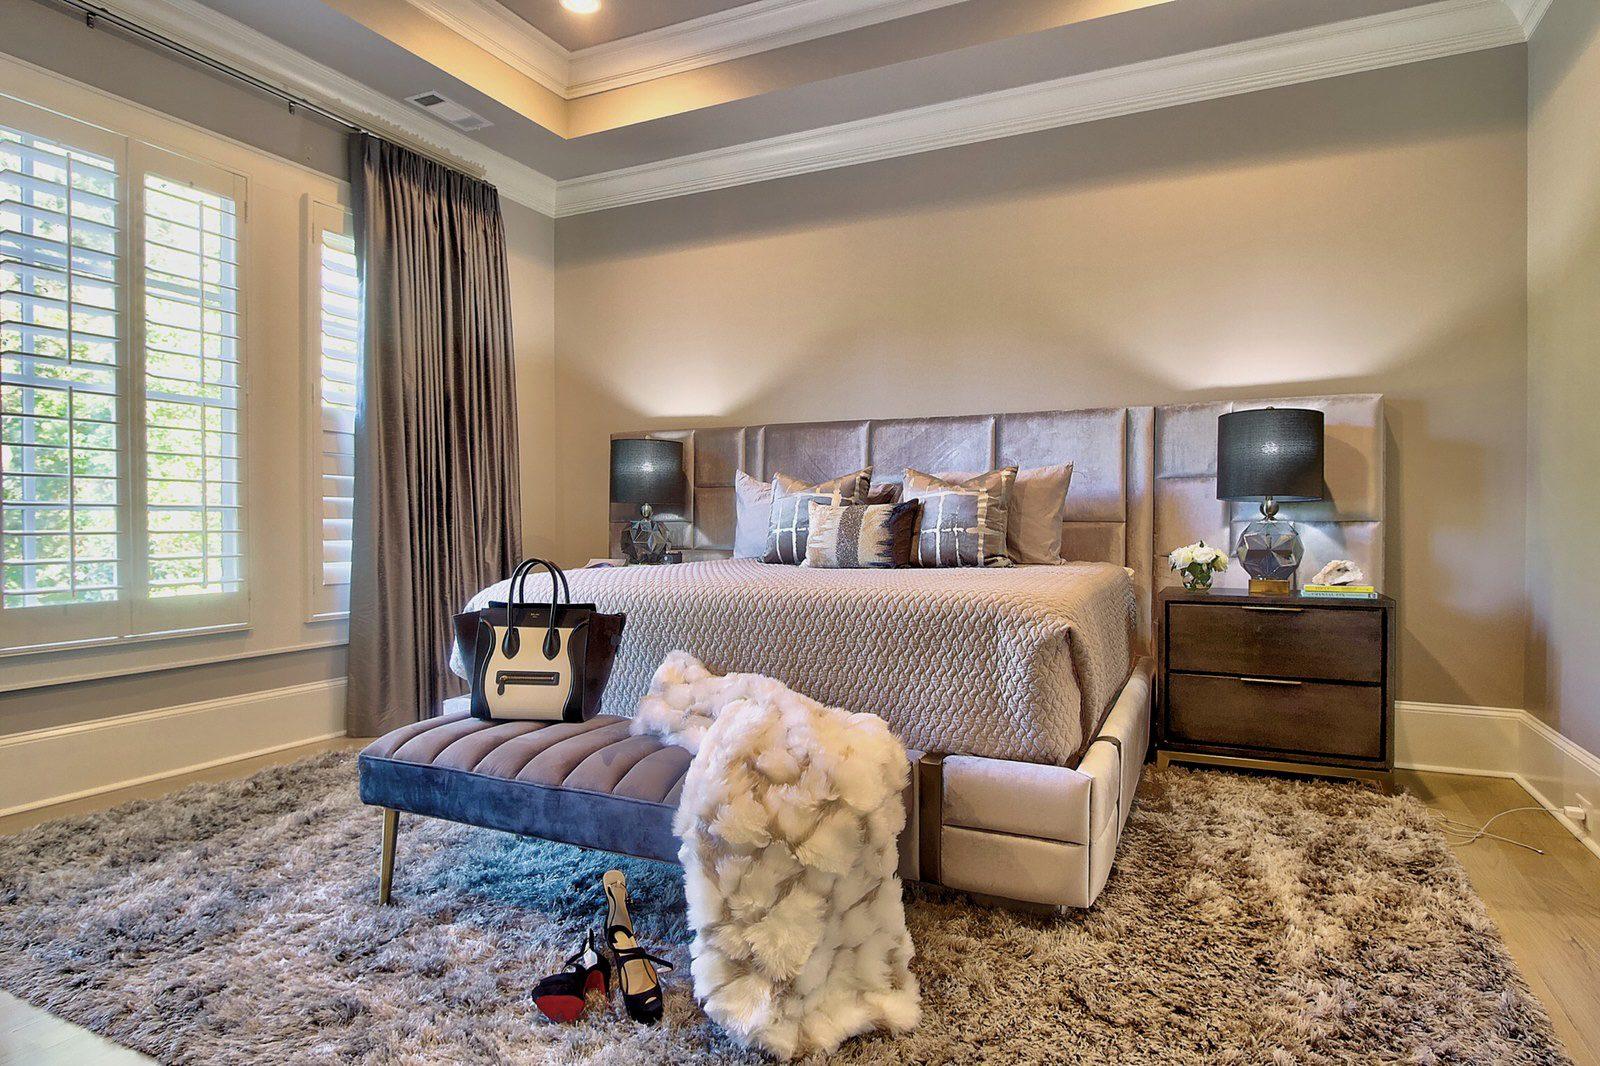 how-custom-bedroom-furniture-can-elevate-a-master-bedroom_blend-home-furnishings_nashville-tn